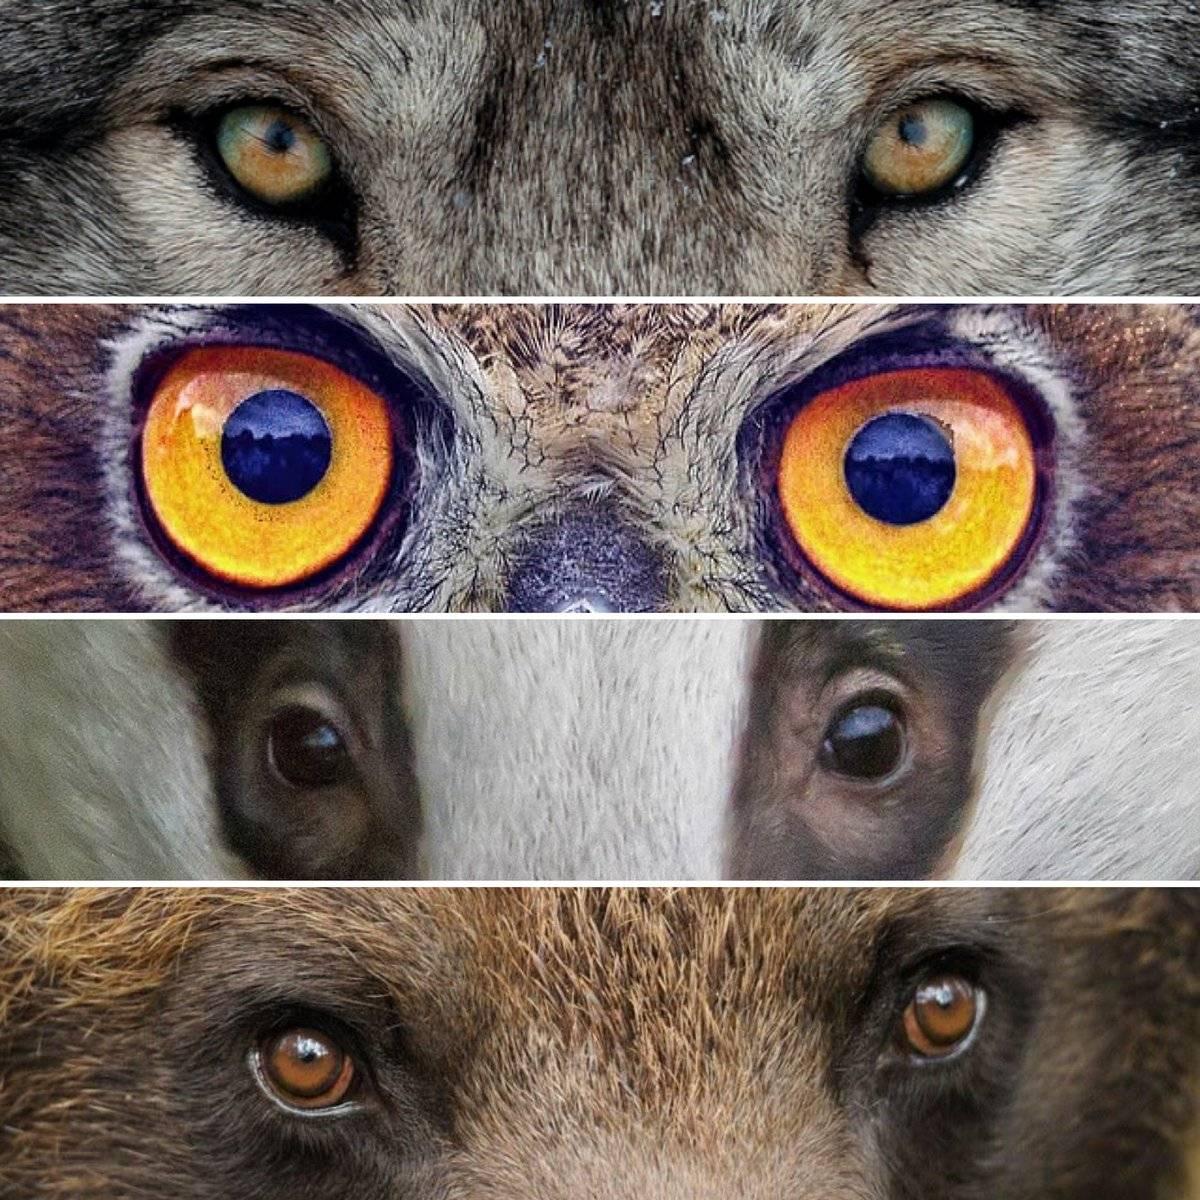 Как видят собаки: какое зрение, различают ли цвета, как собаки видят в темноте